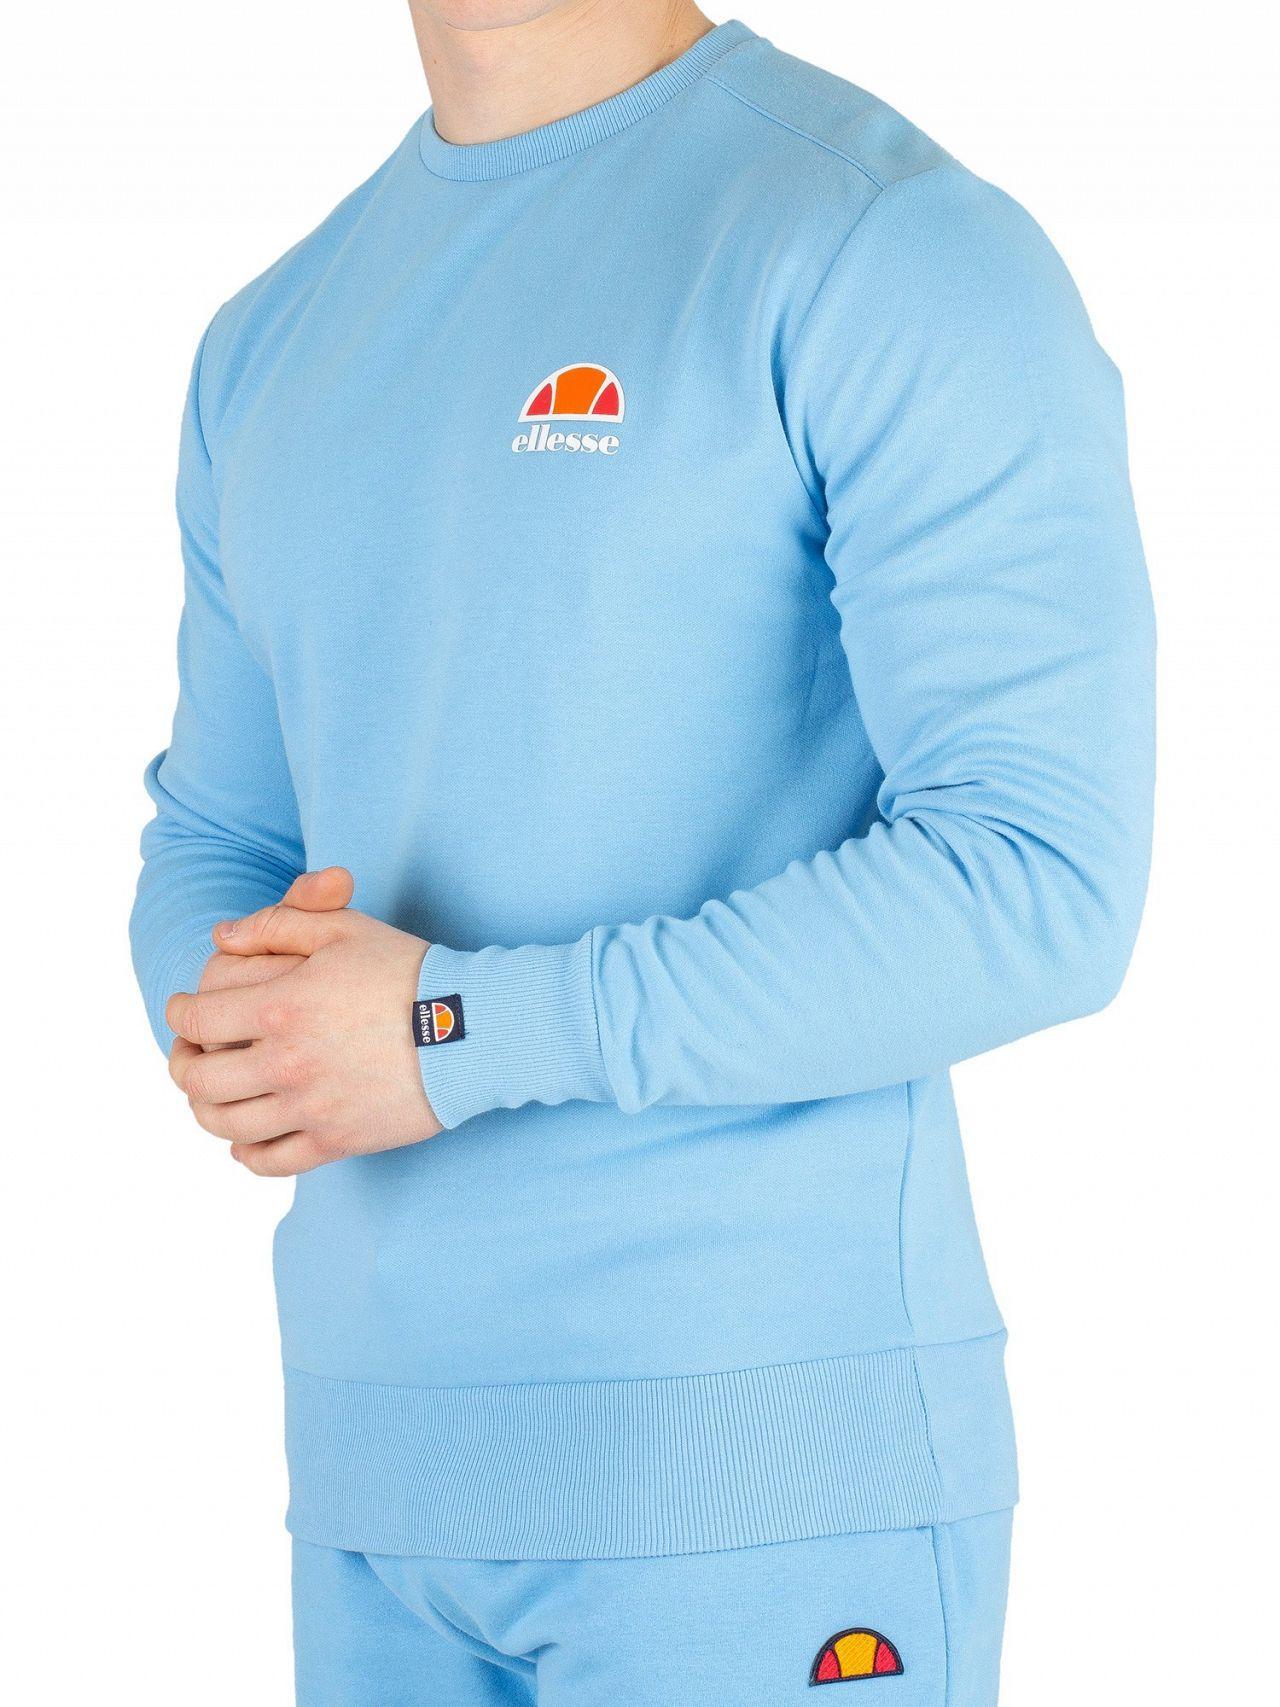 d6d65e240b Ellesse Light Blue Anguilla Sweatshirt in Blue for Men - Lyst